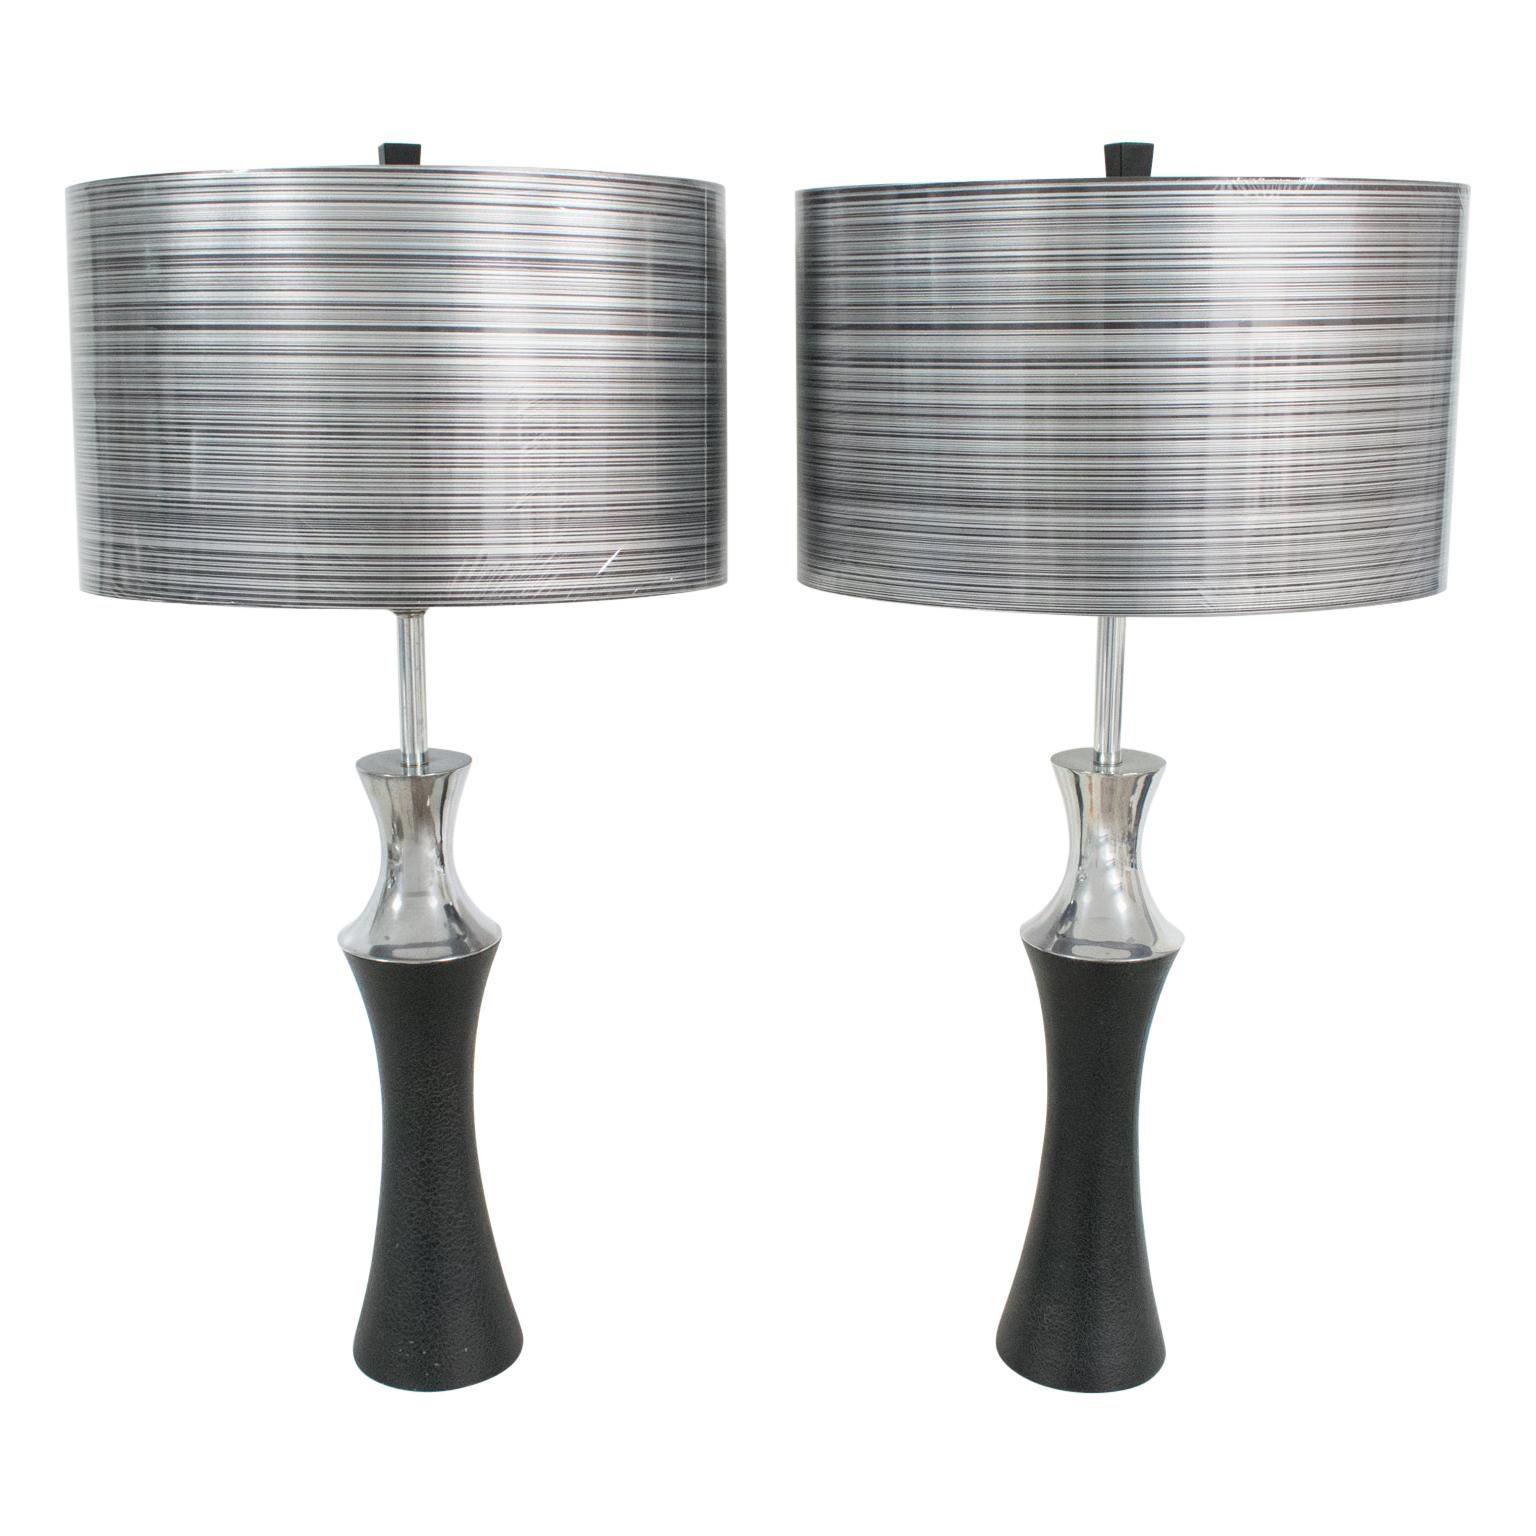 1960s Mutual Sunset Aluminum Table Lamp, a pair